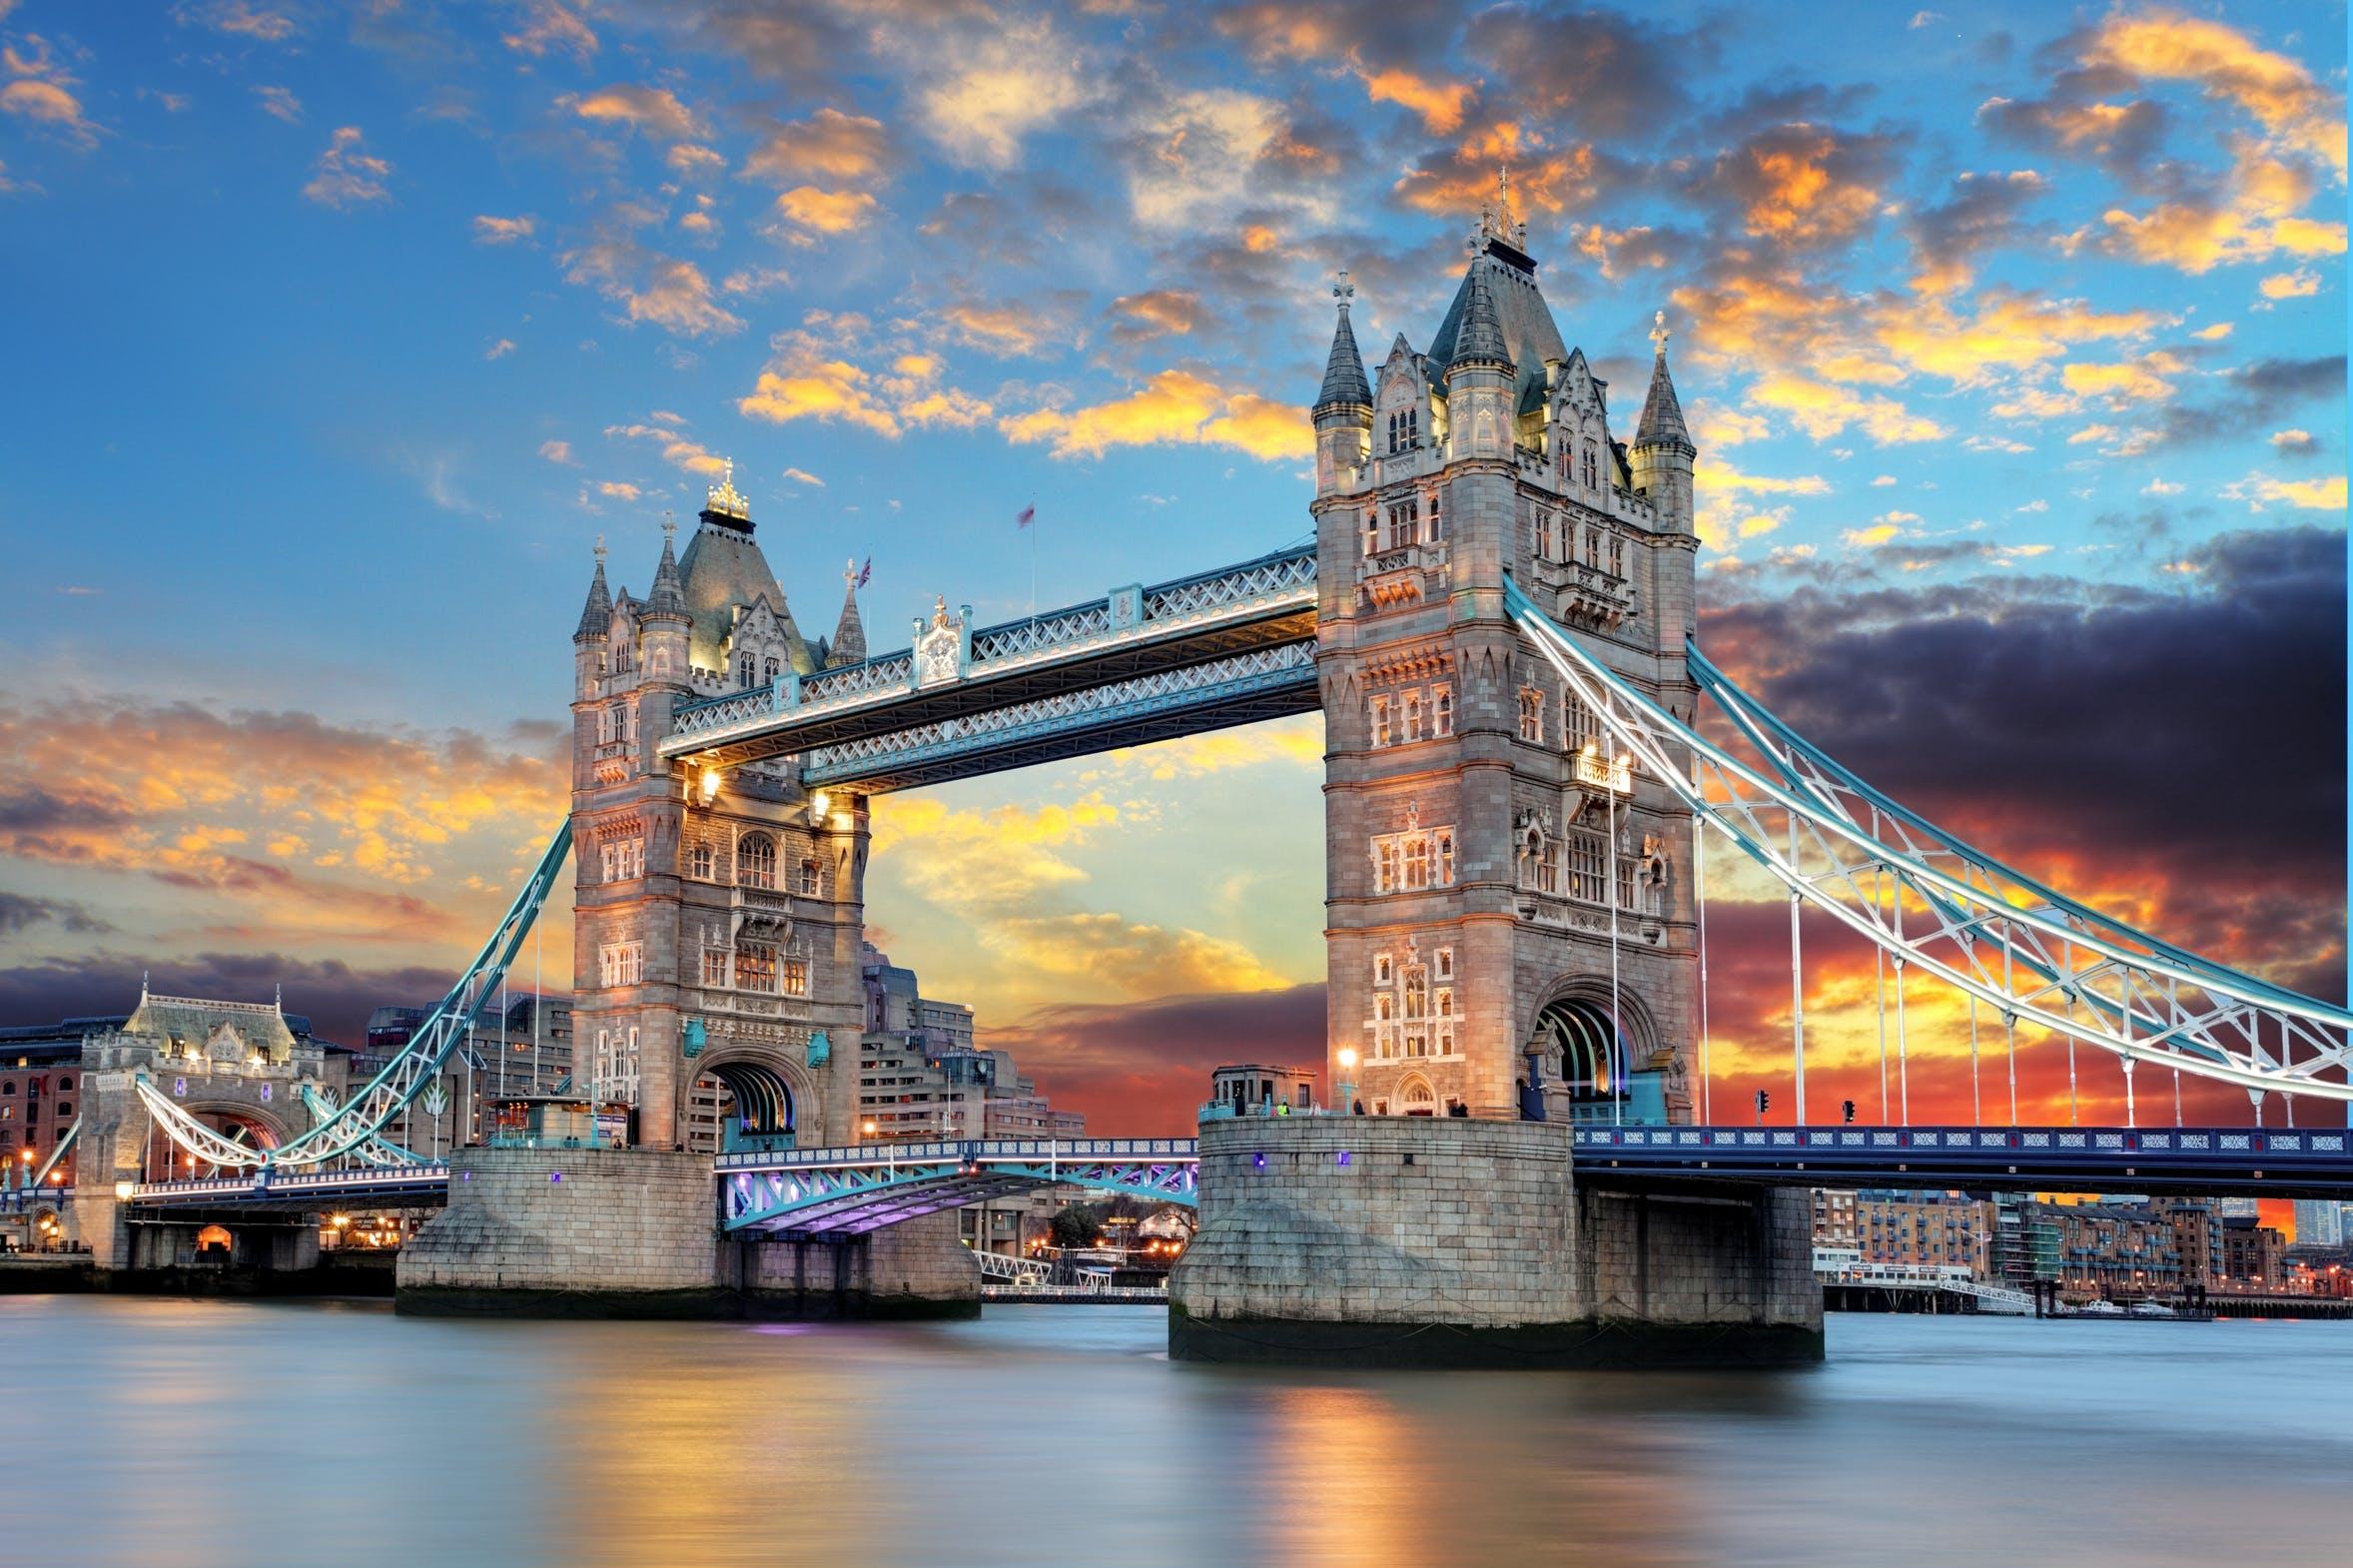 Tower Bridge experience | musement